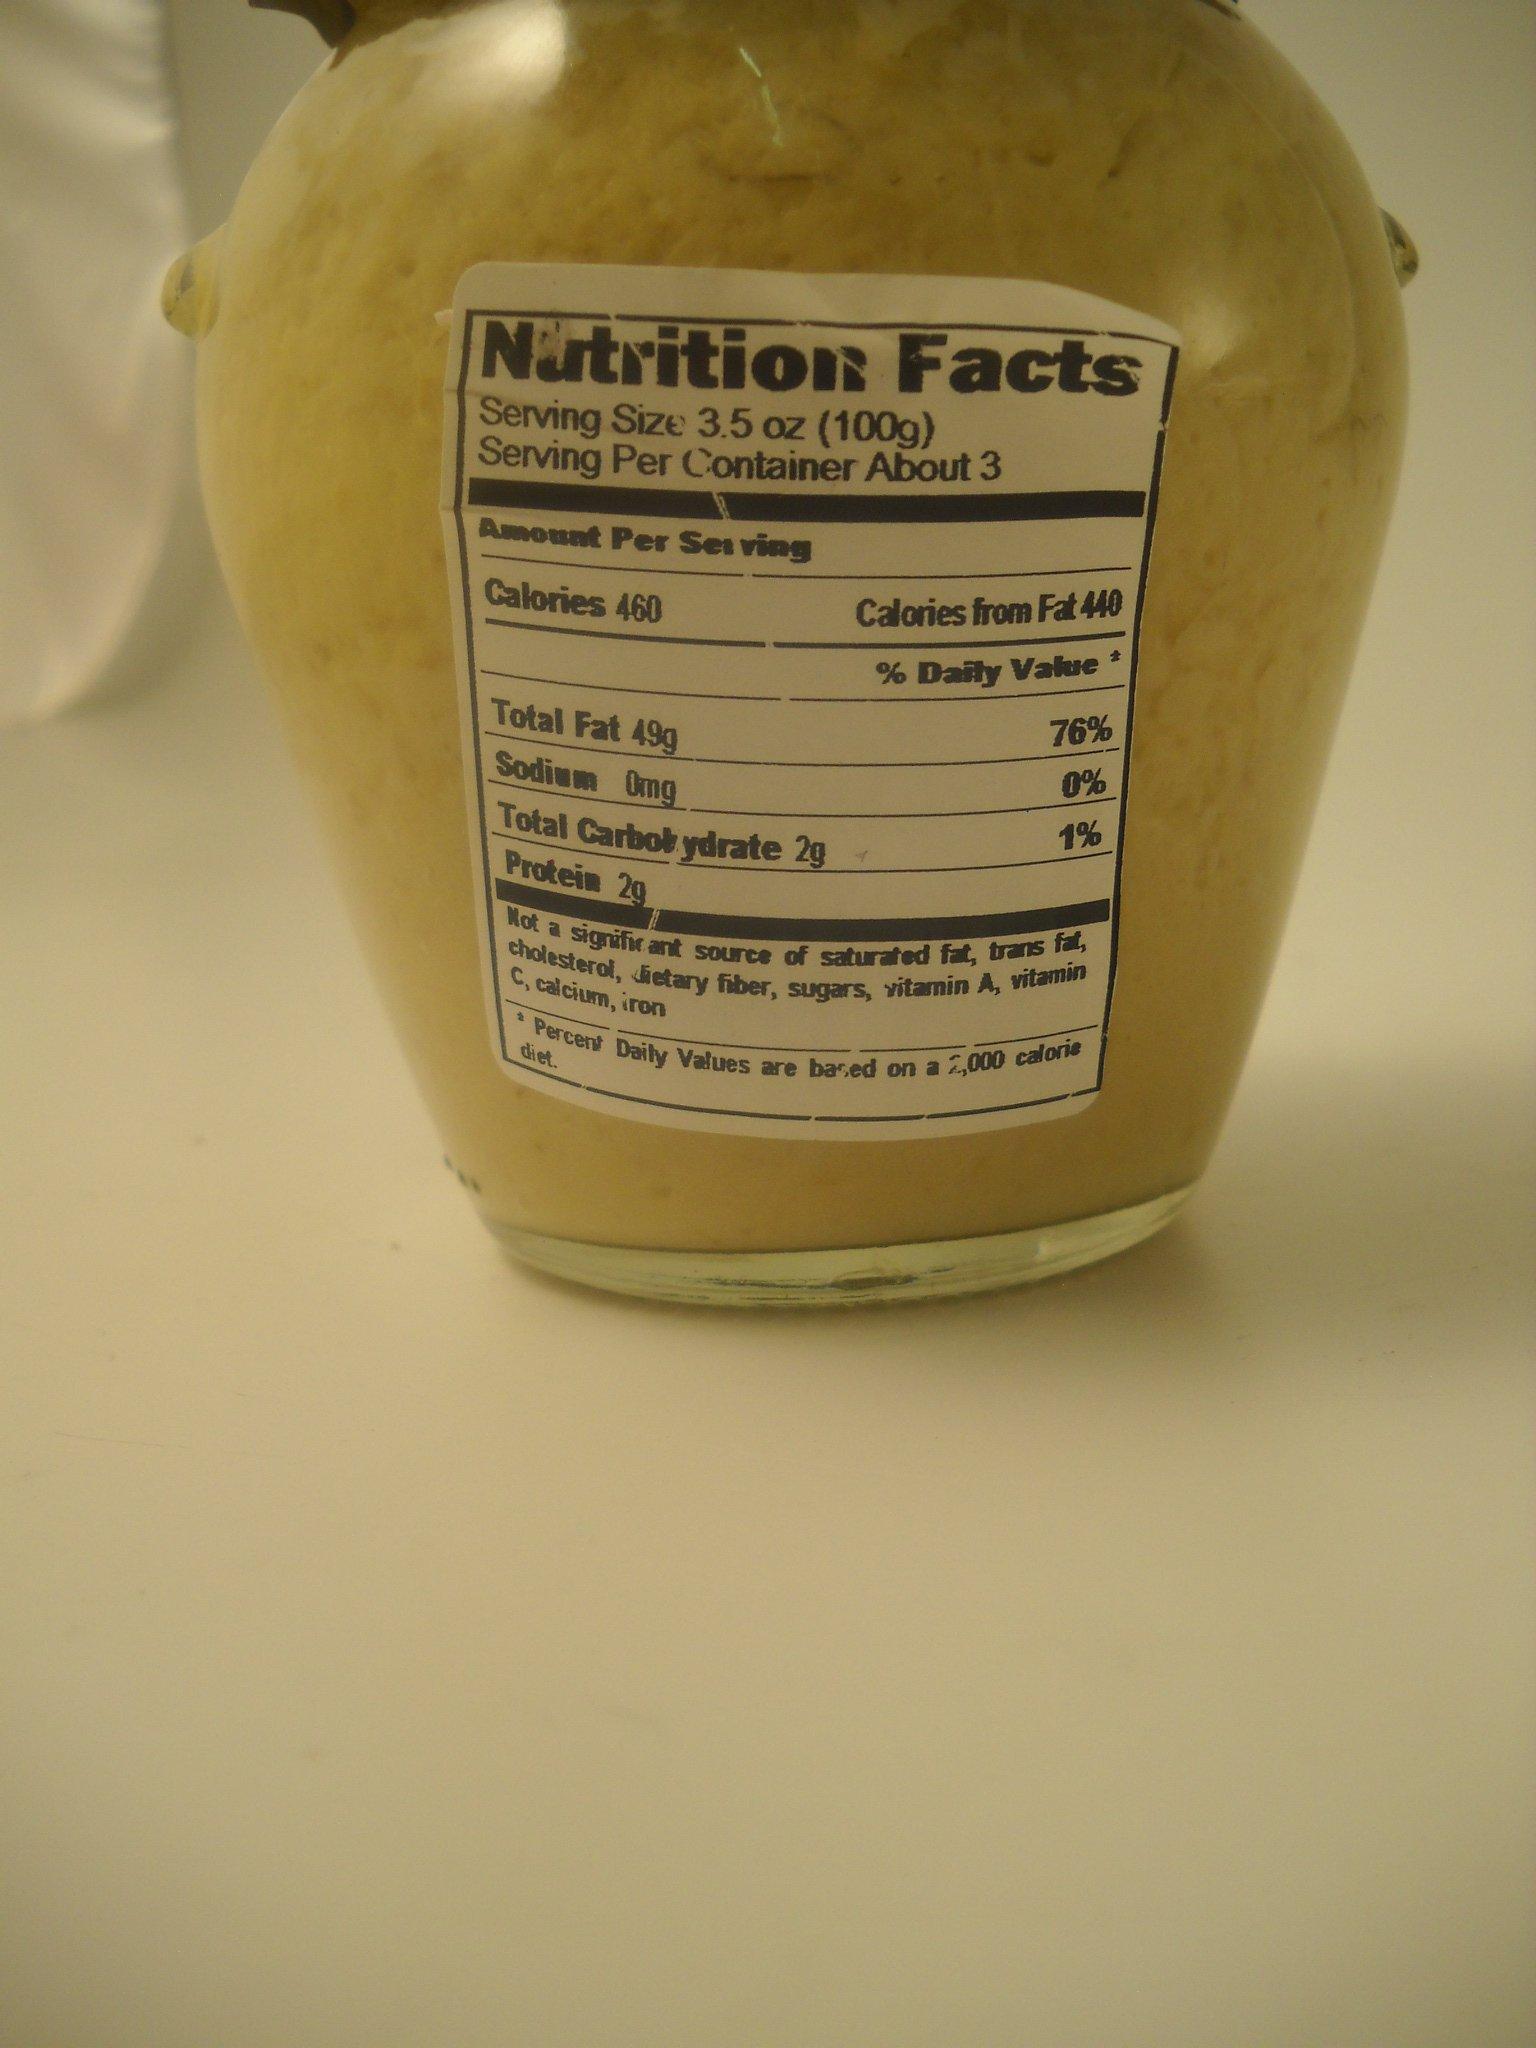 La Cerignola Cream of Artichoke